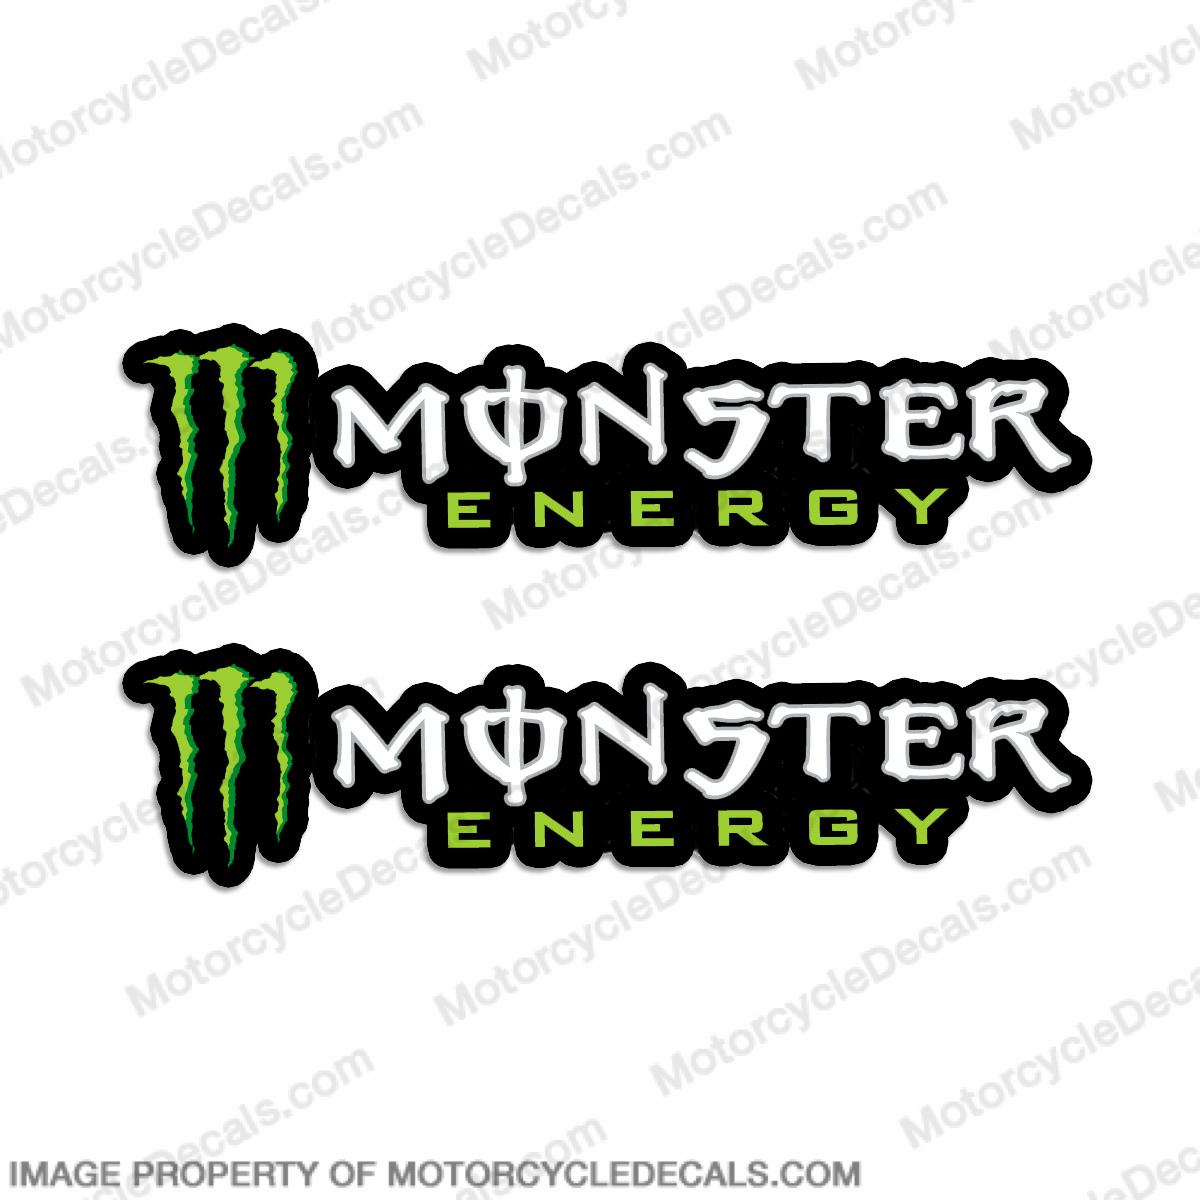 other decals - monster energy decals